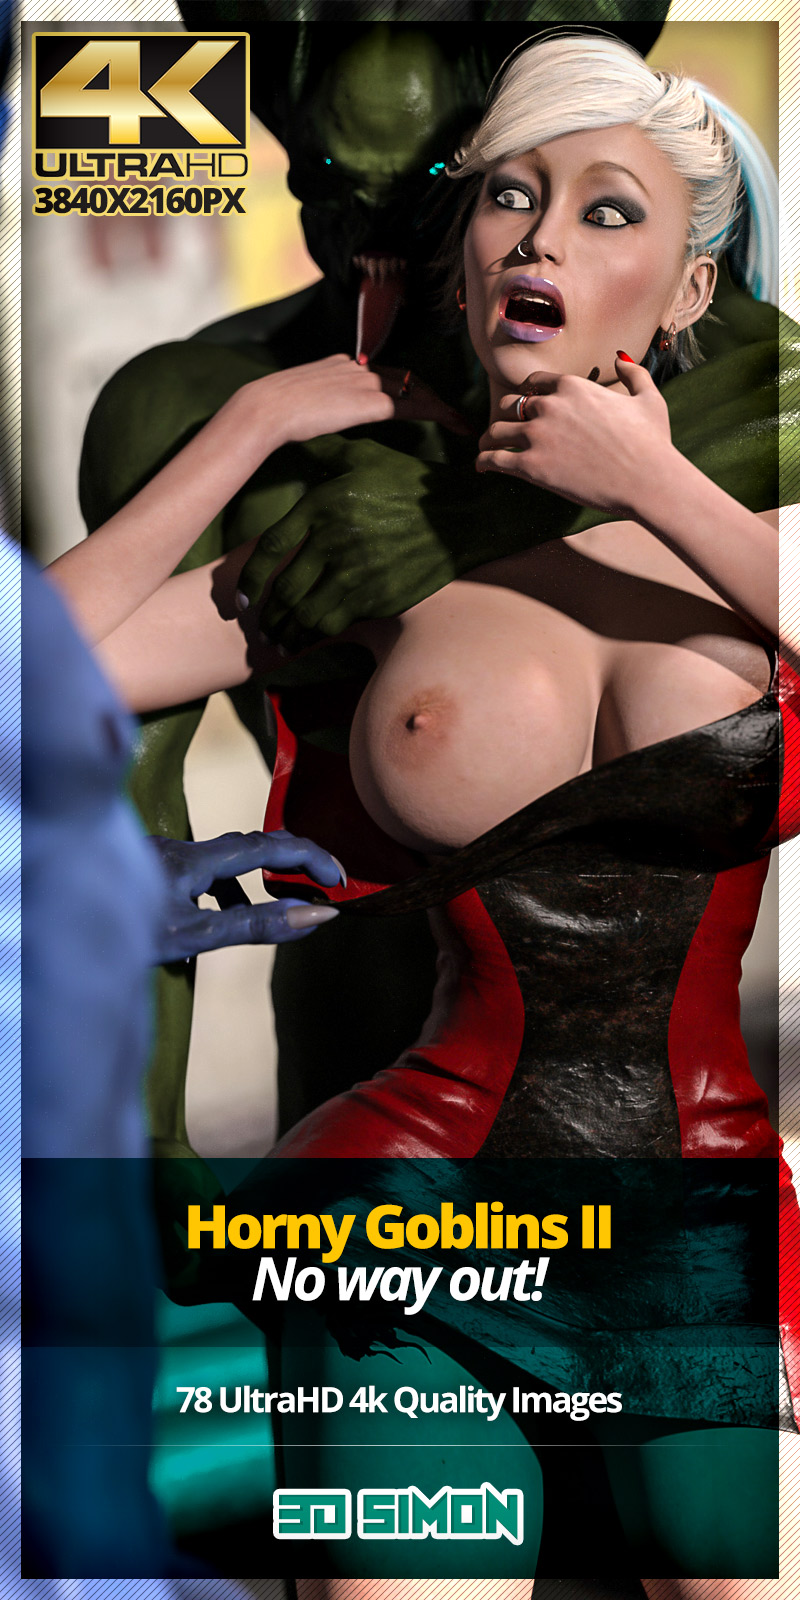 Horny Goblins 2- No Way Out,3DSimon image 1